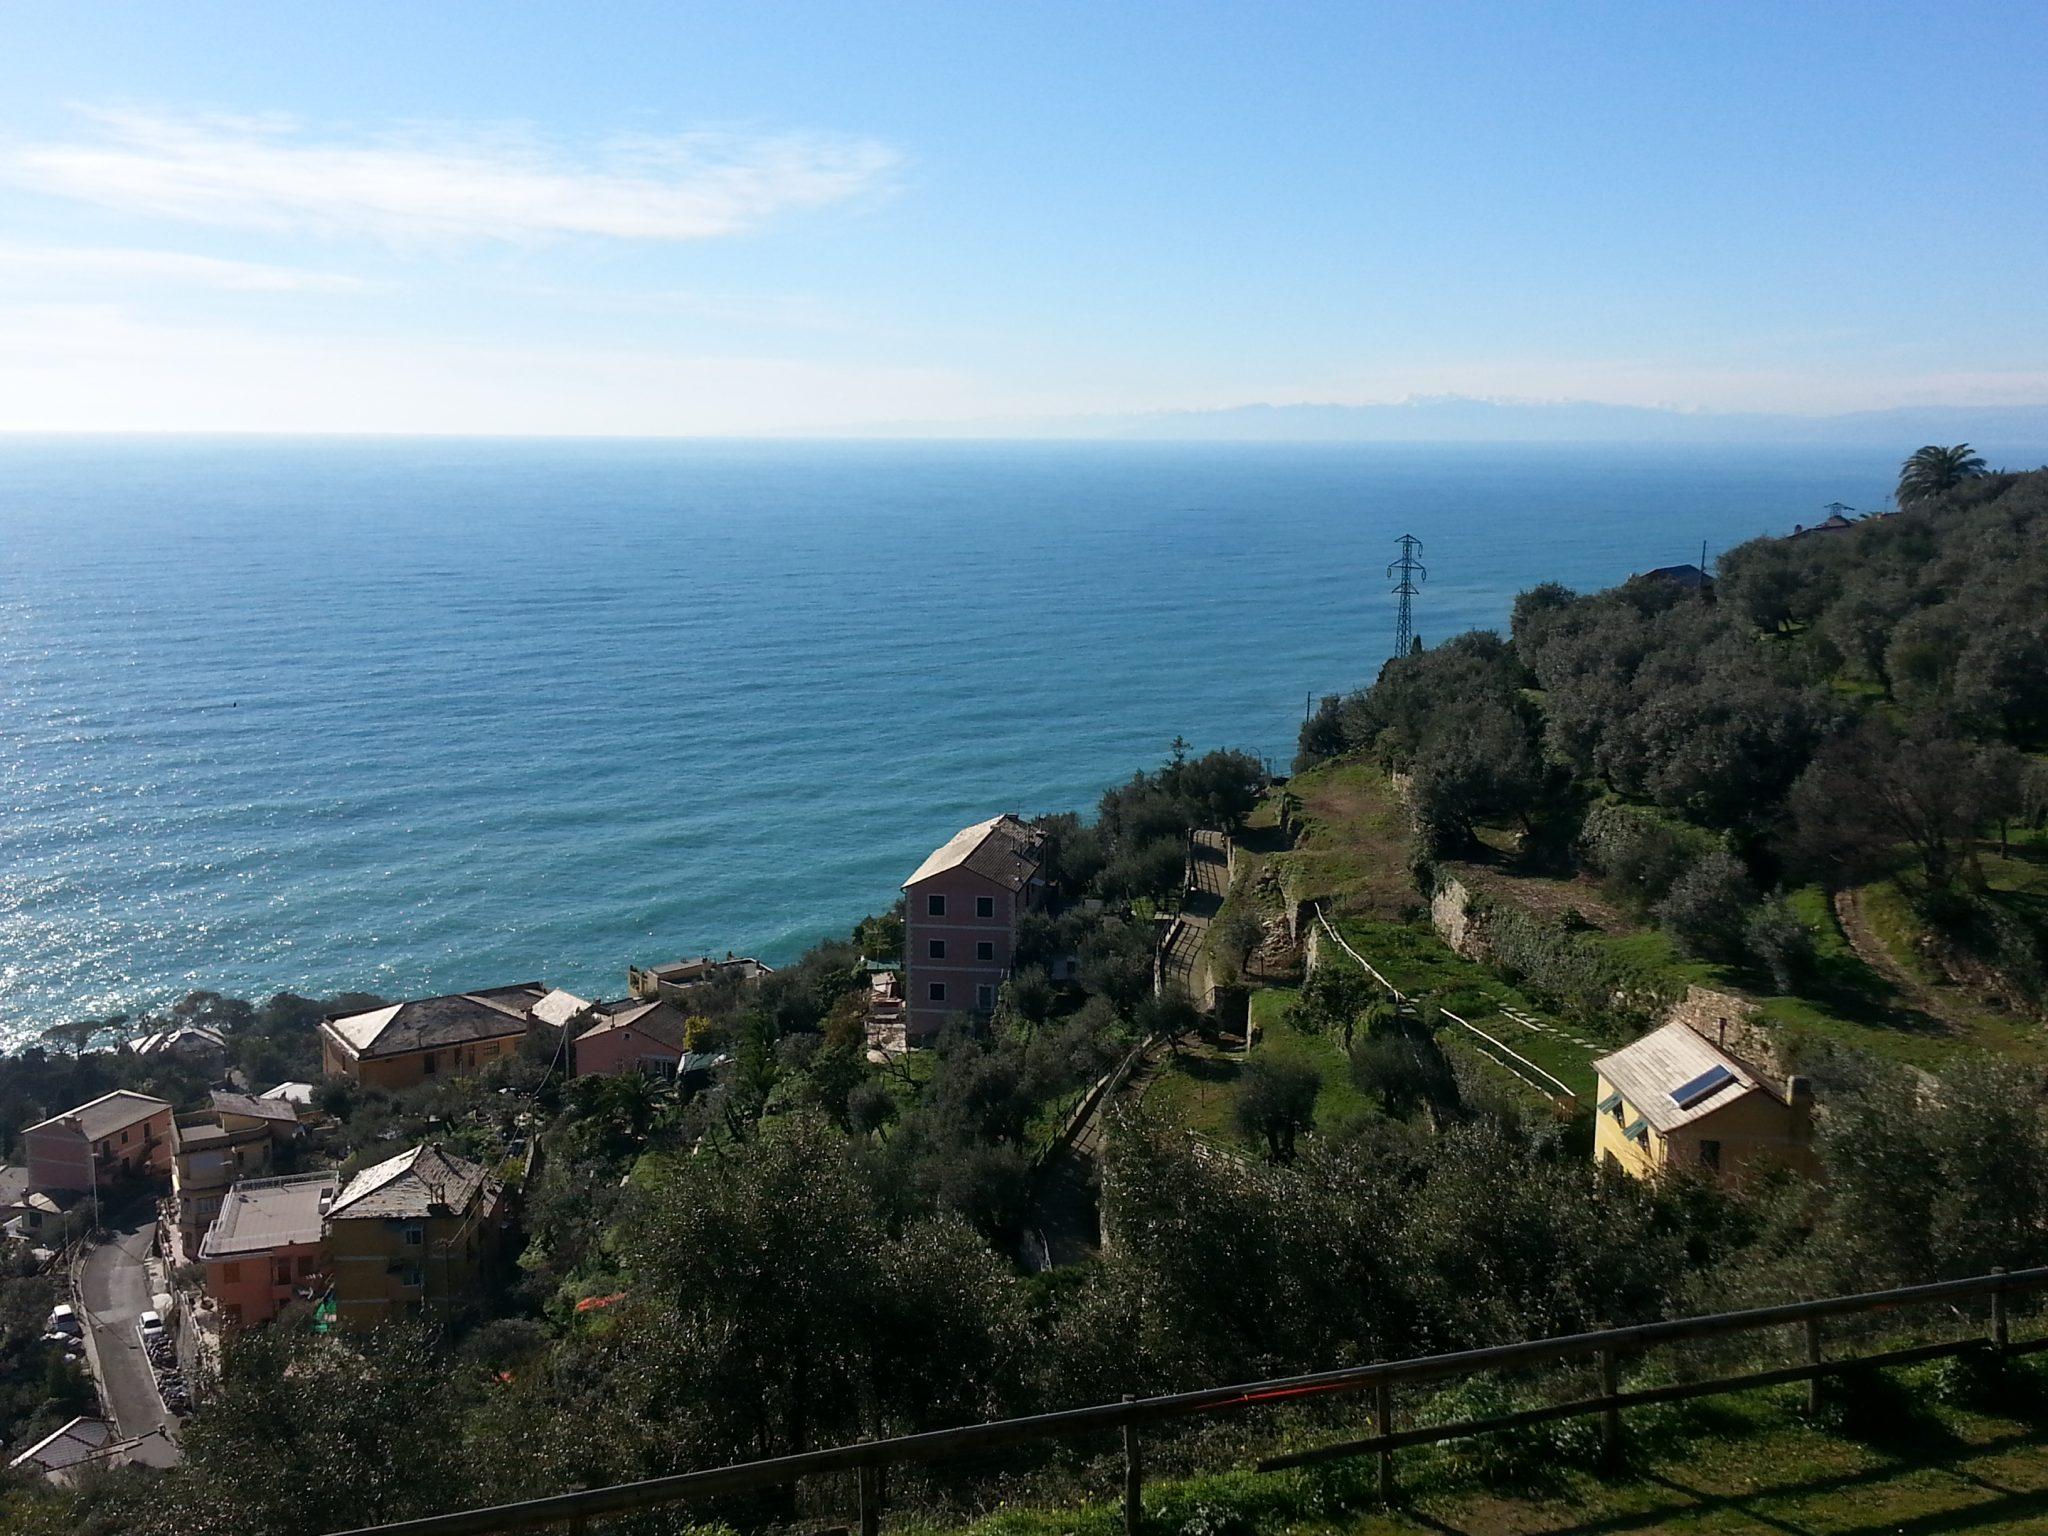 Italian Riviera horizon